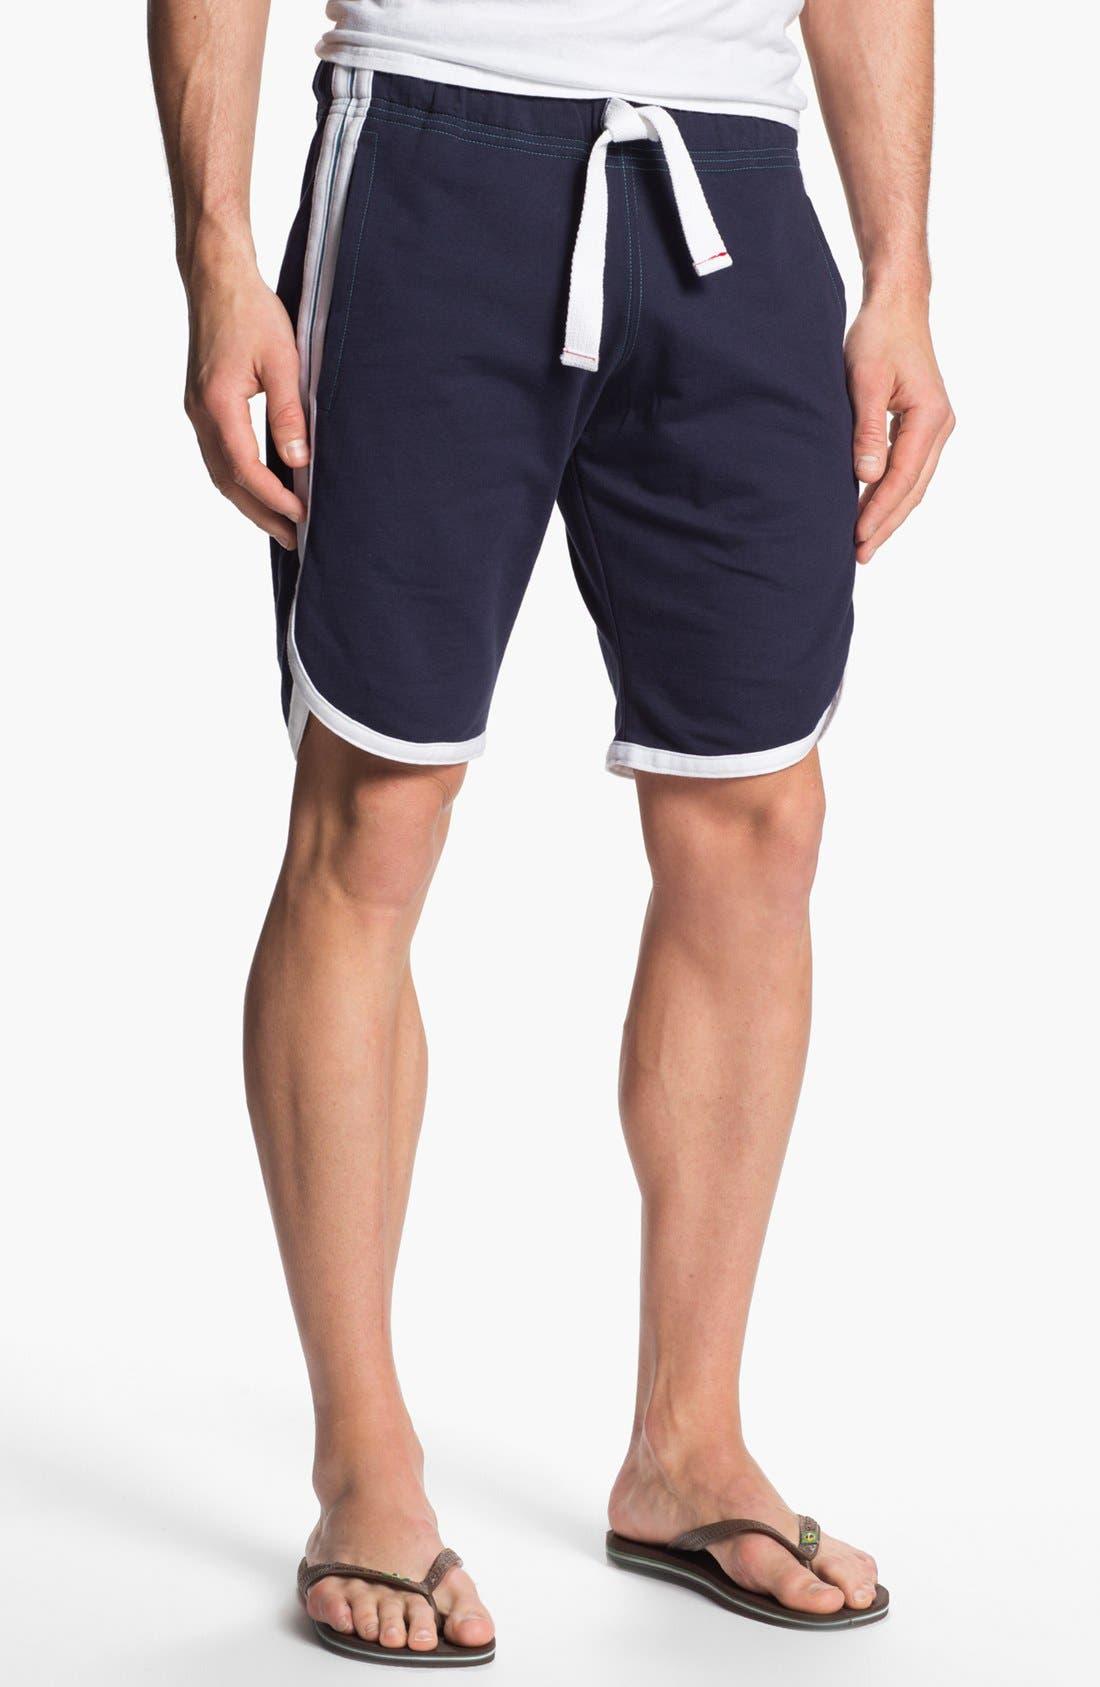 Alternate Image 1 Selected - Andrew Christian Retro Athletic Shorts